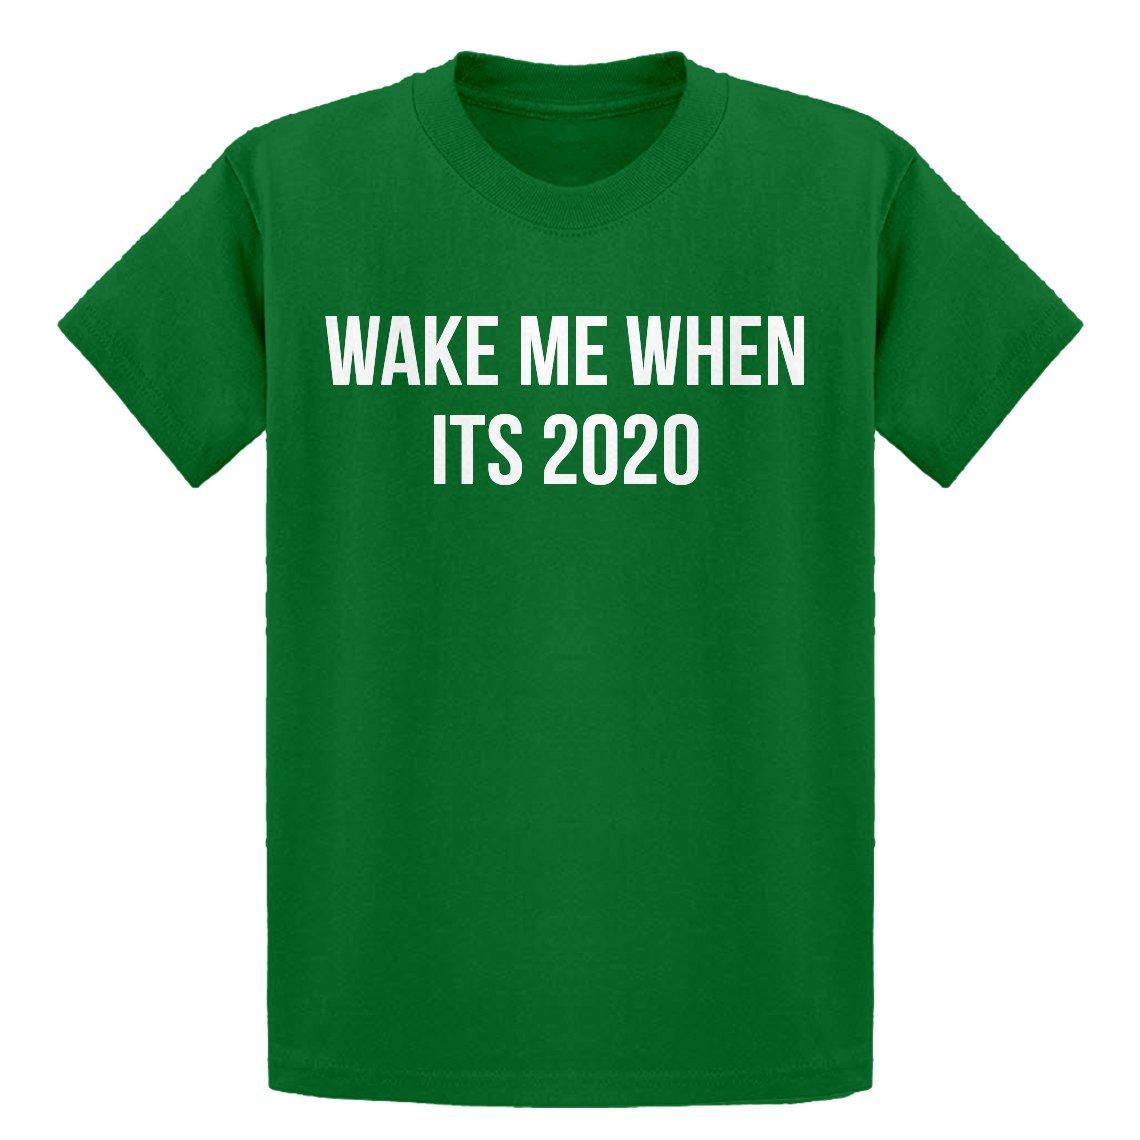 Wake Me When its 2020 Kids T-Shirt